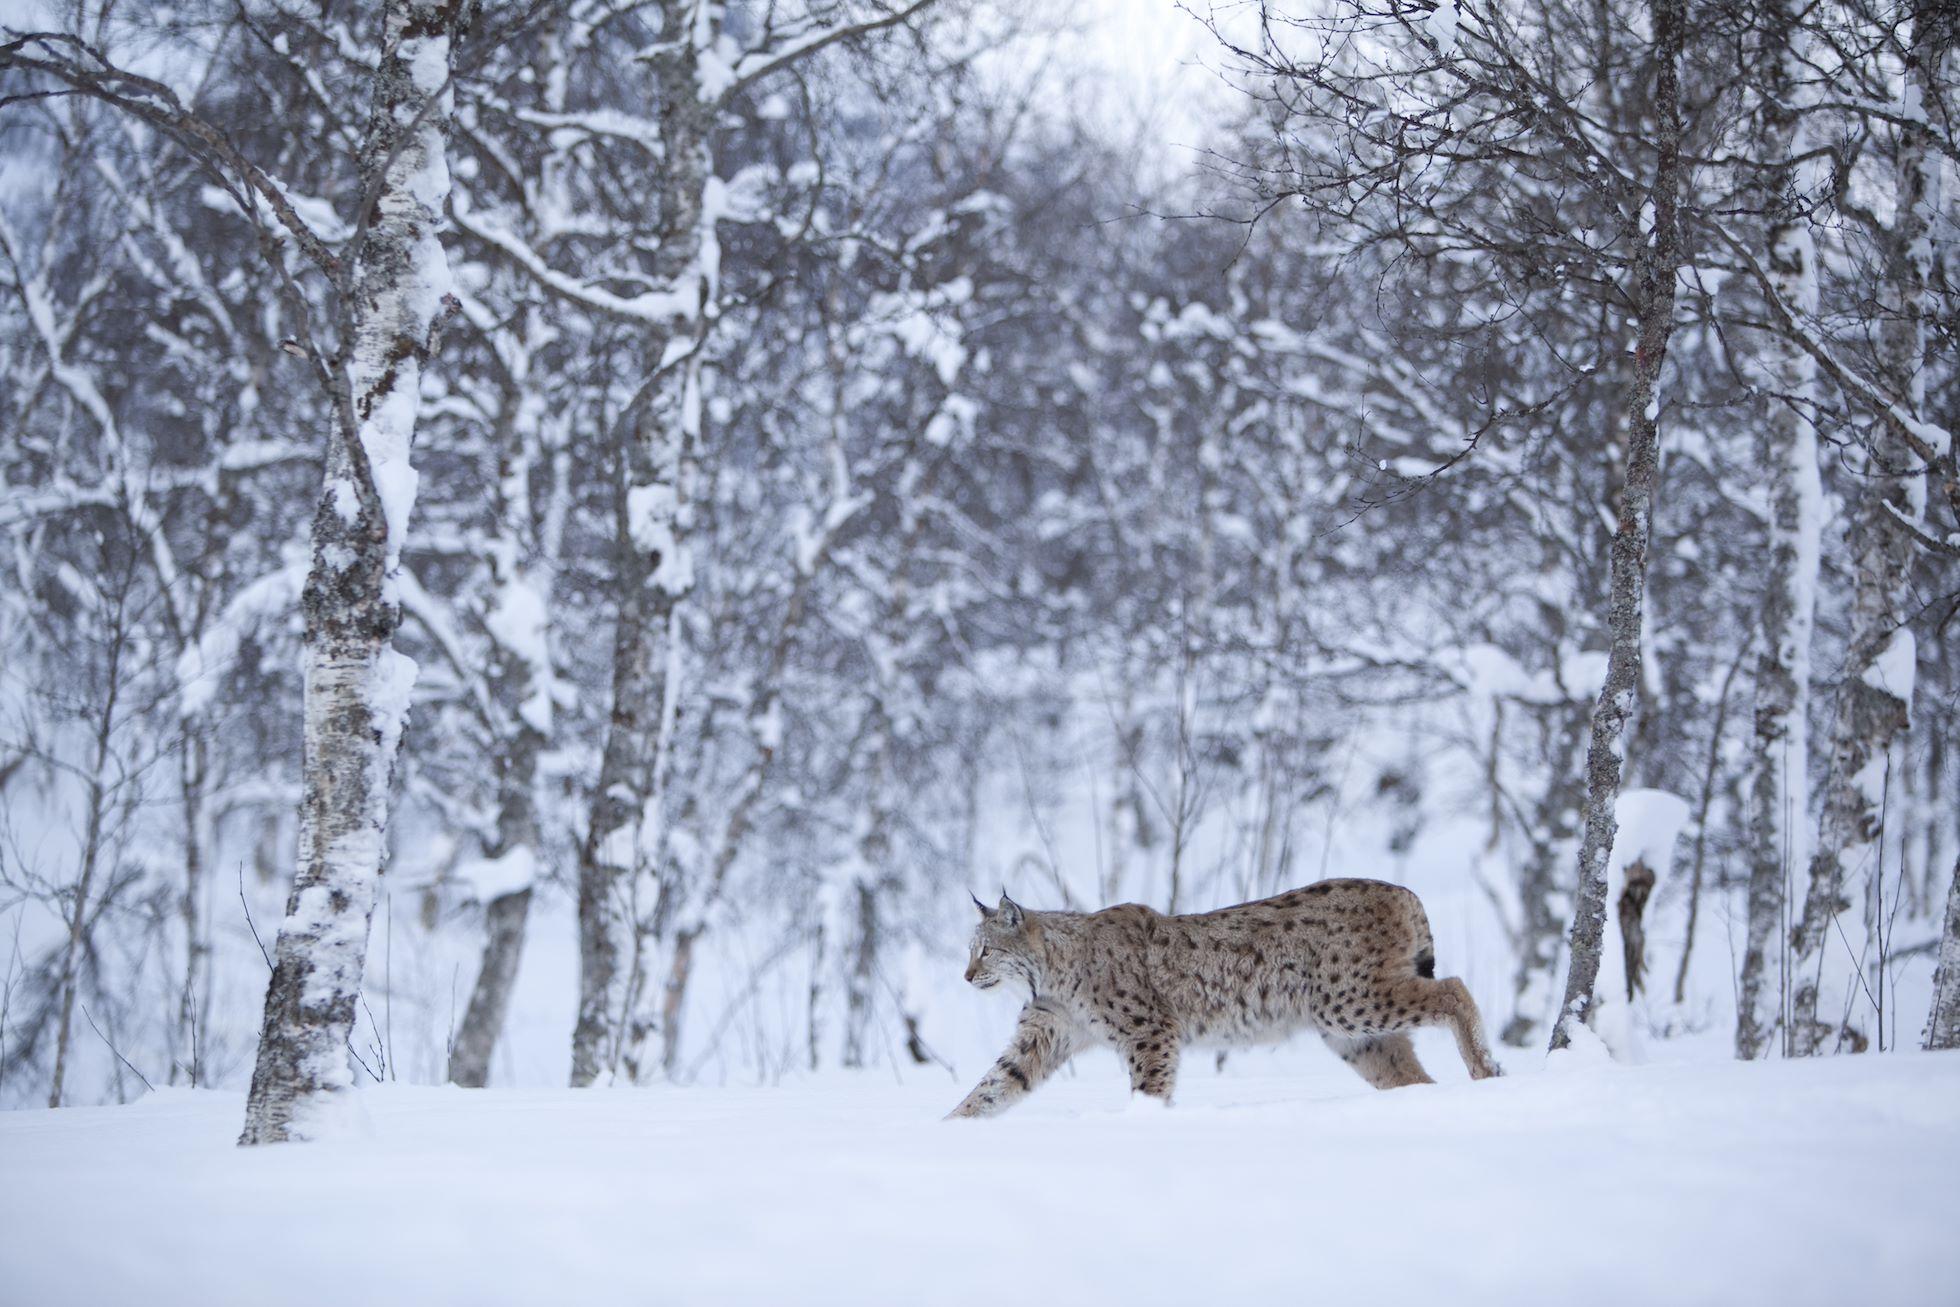 European Lynx (lynx lynx) in winter birch forest, Tromso, Norway (c)